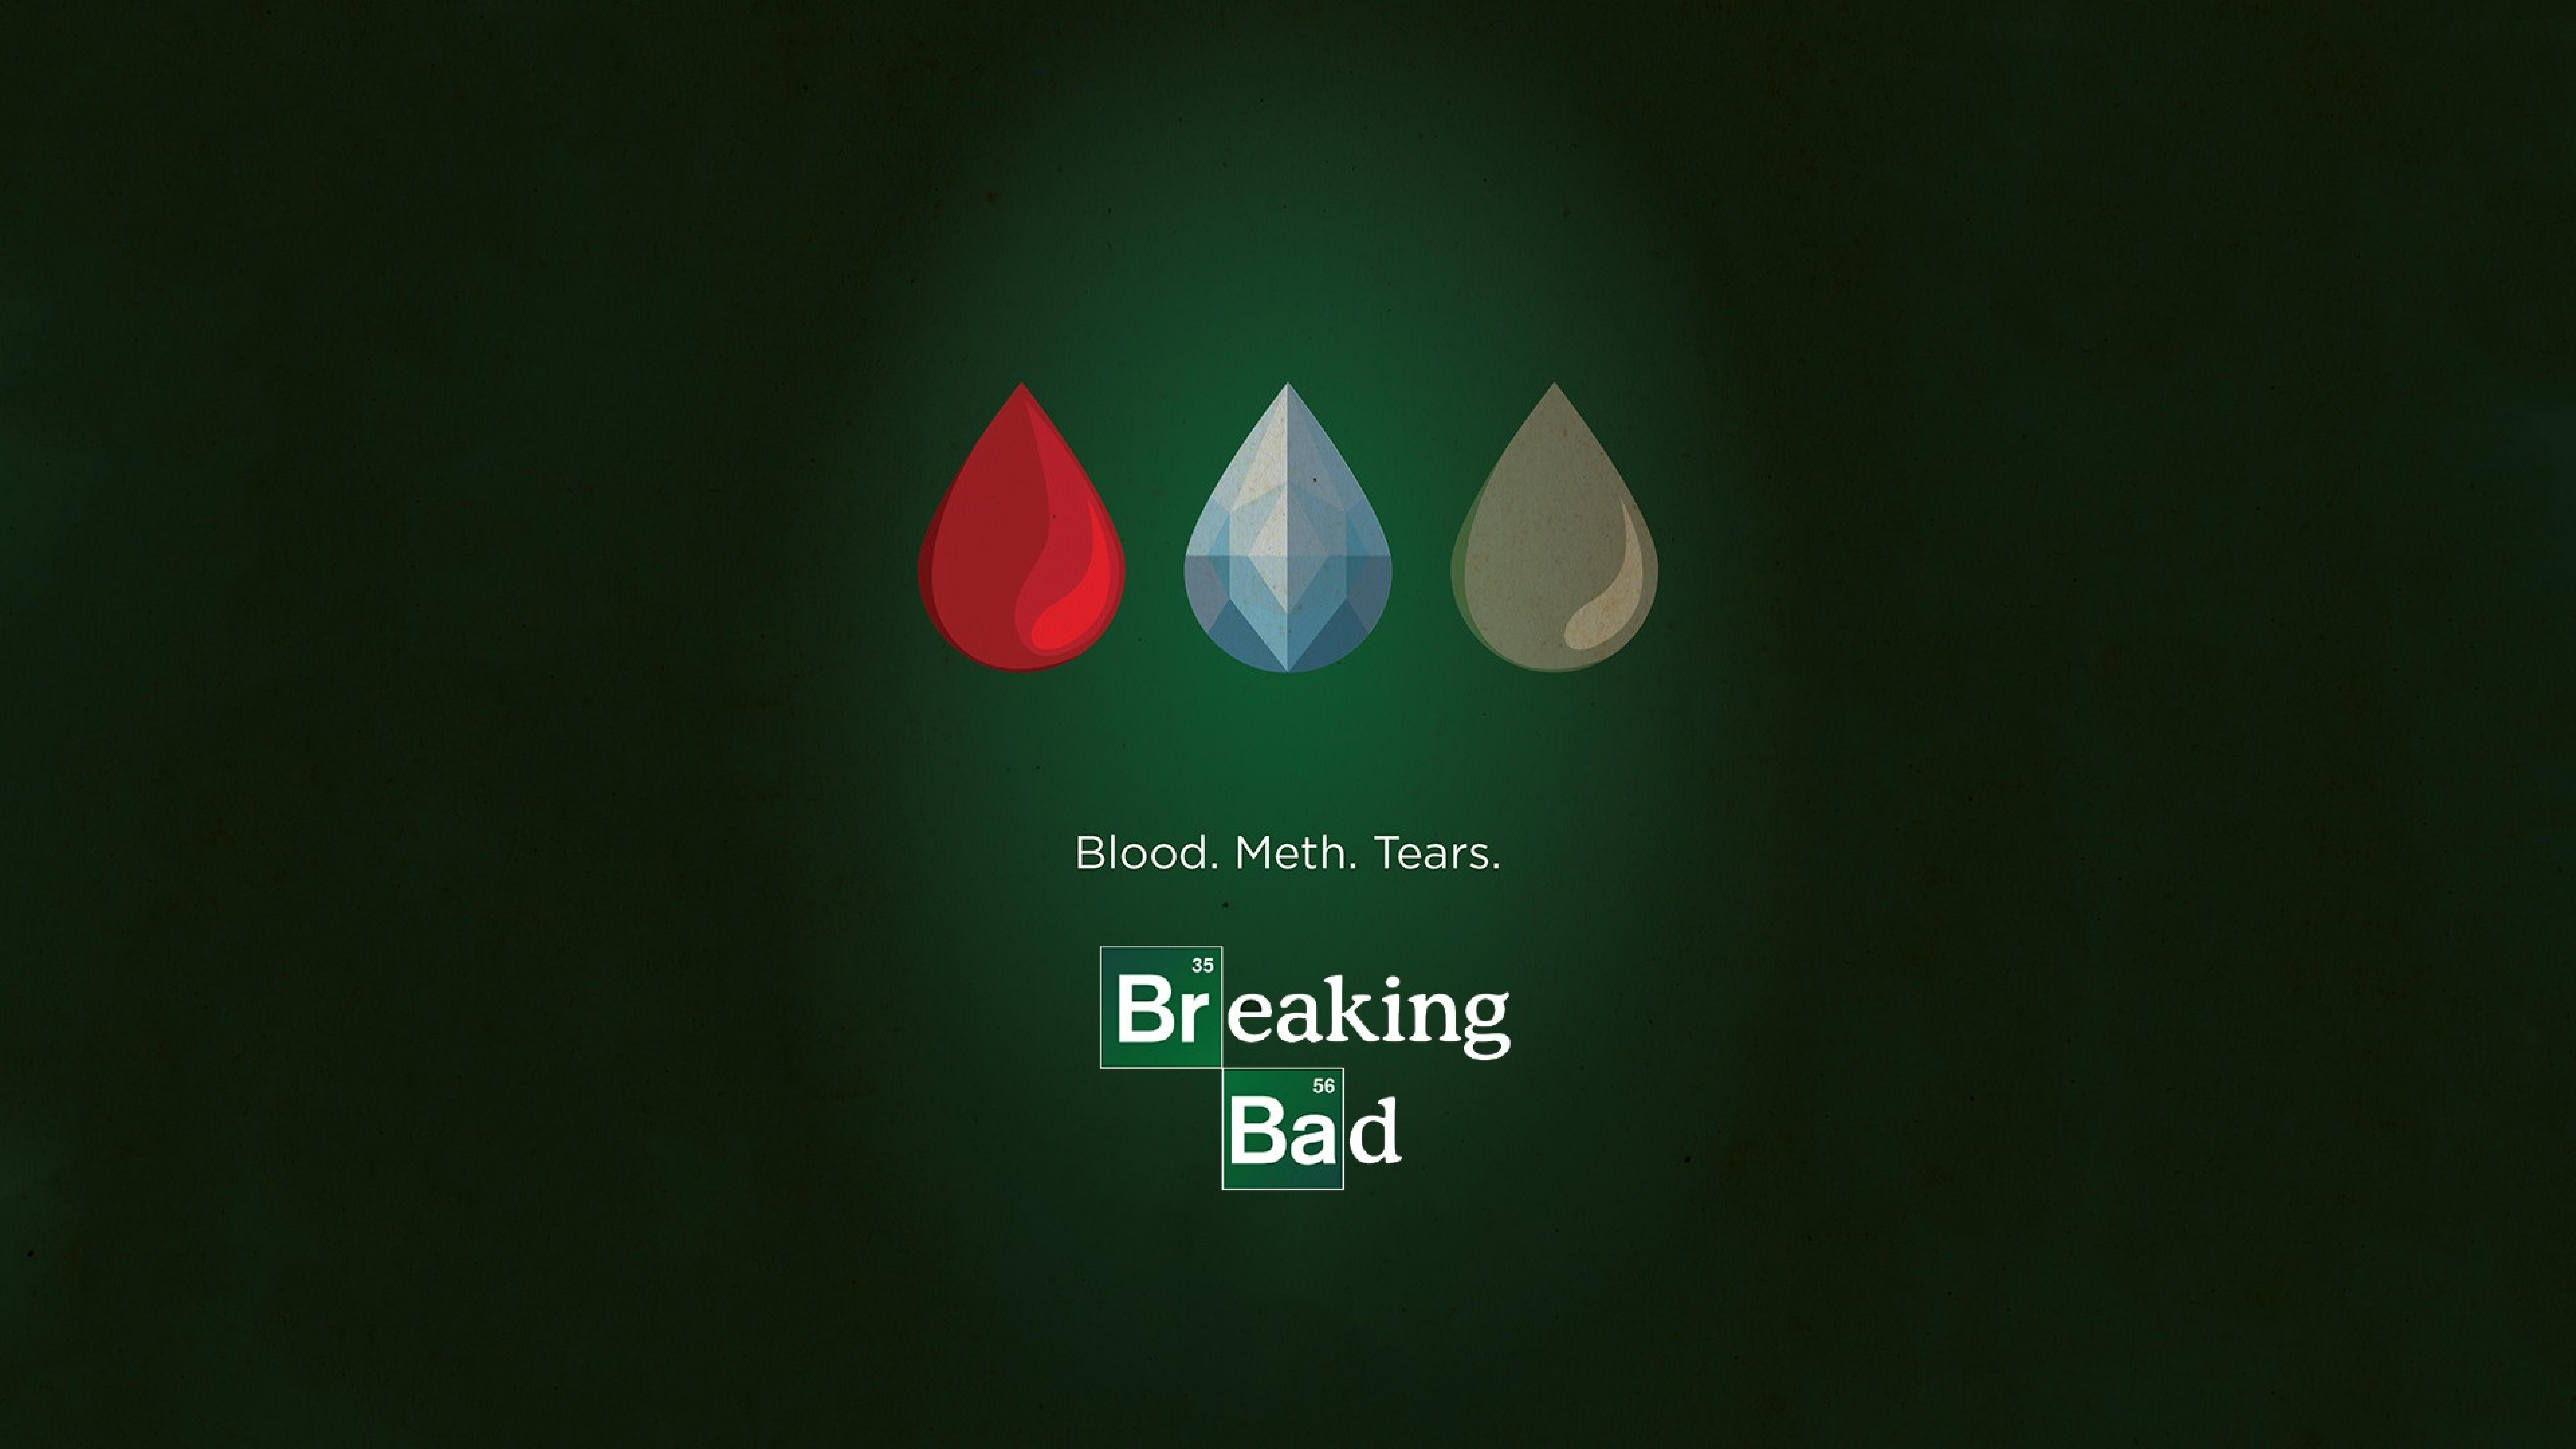 breaking bad blood meth amp tears poster full hd wallpaper